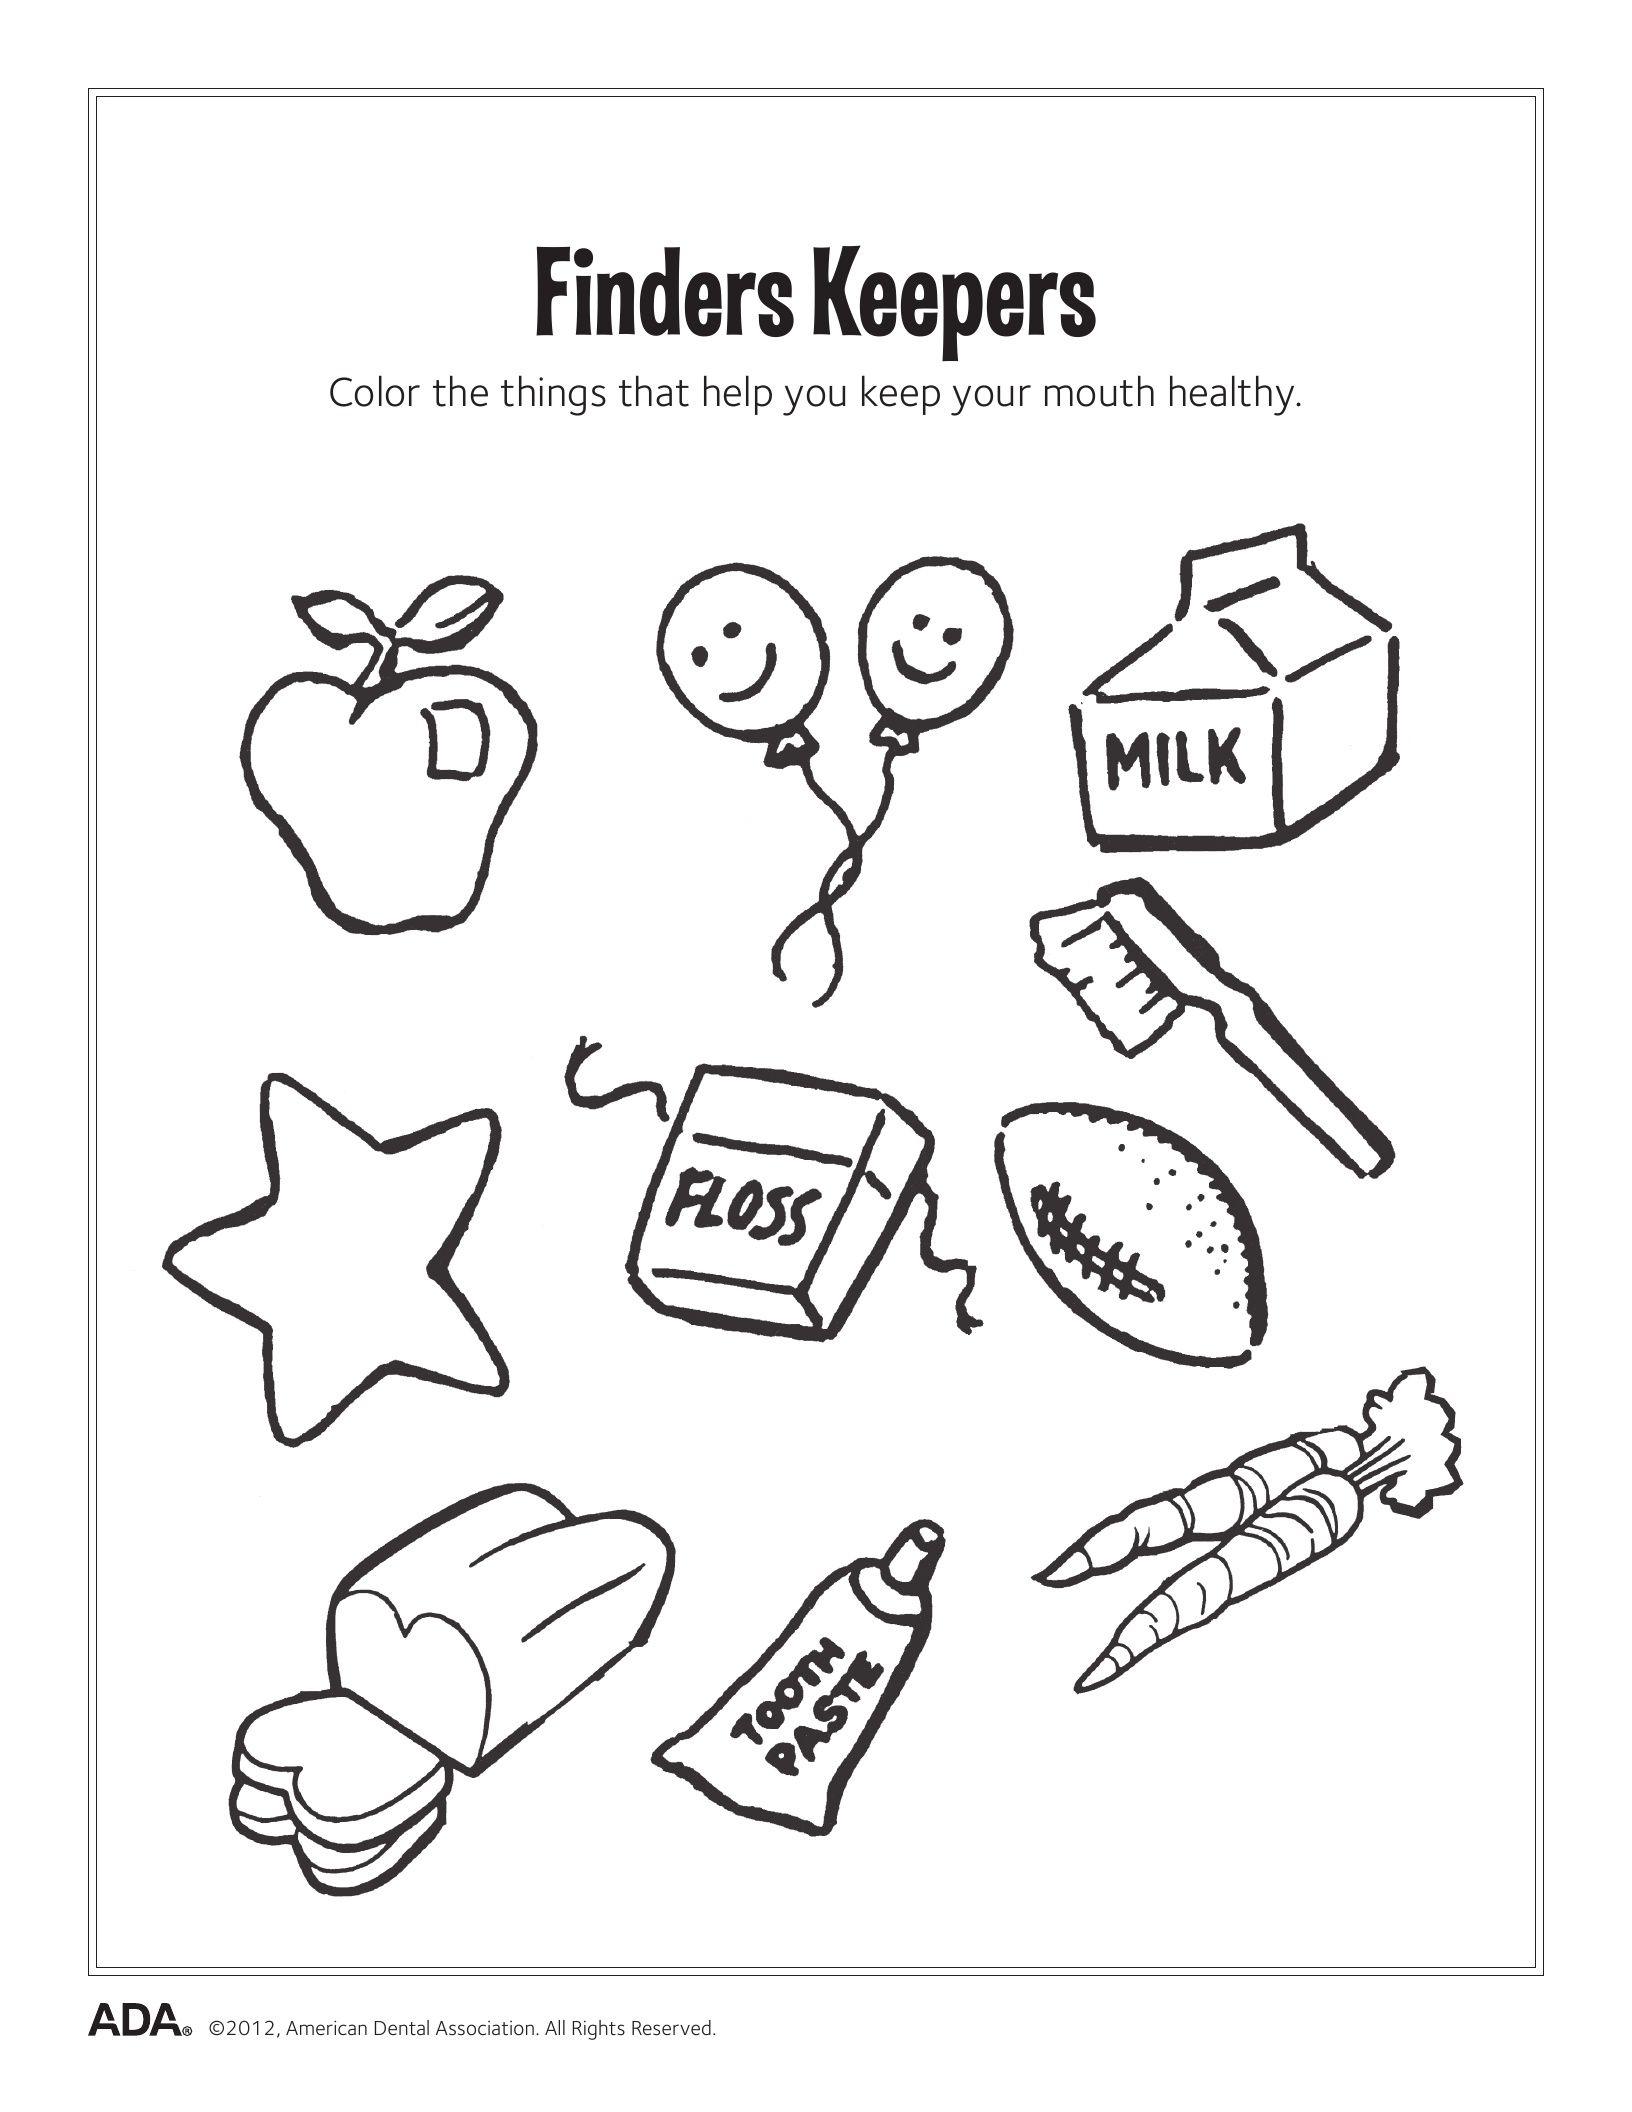 11 Dental Health Activities Puzzle Fun (Printable) | Dental Hygiene | Dental Hygiene Printable Worksheets